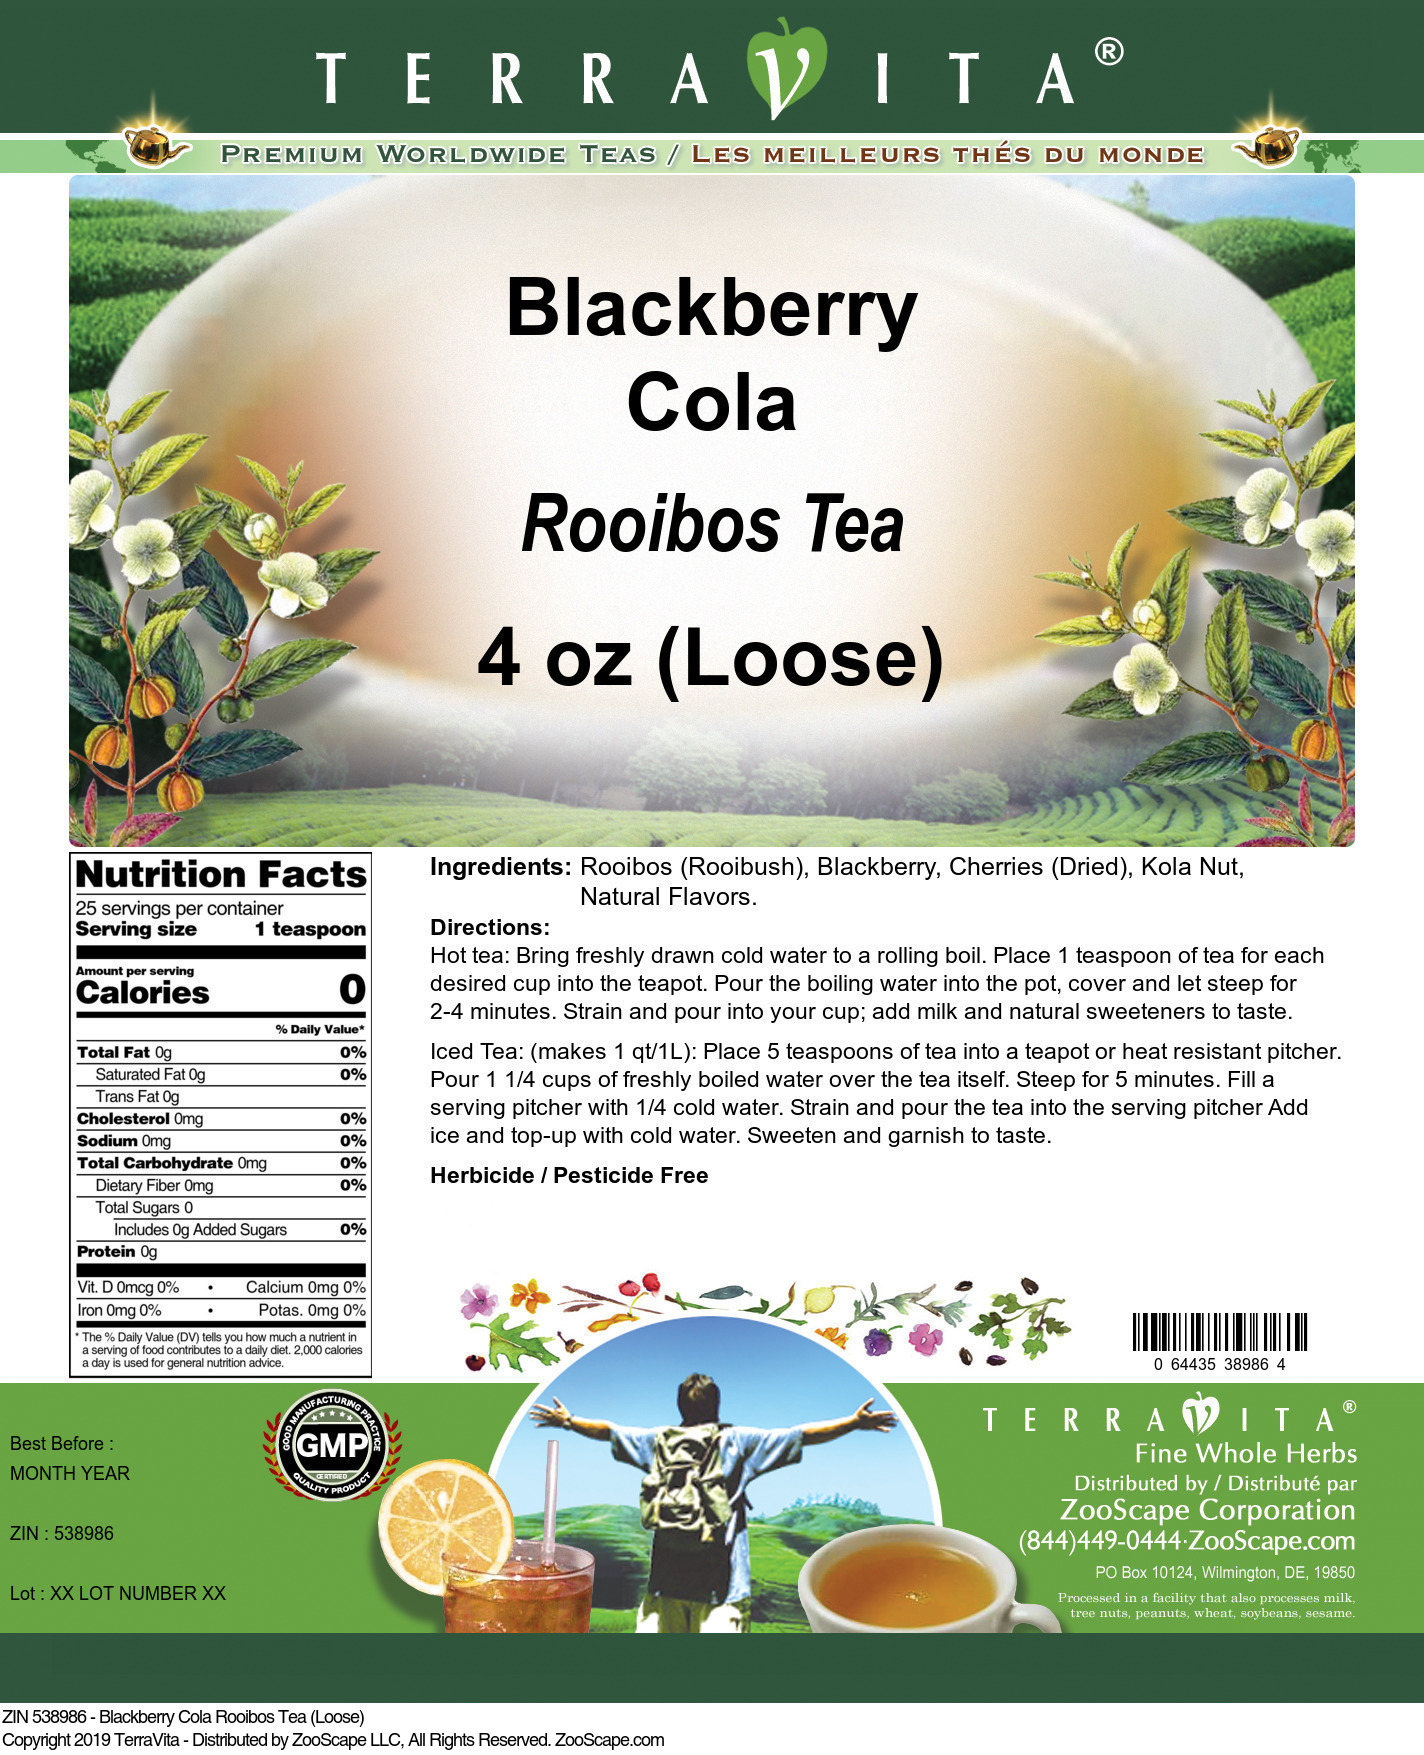 Blackberry Cola Rooibos Tea (Loose)